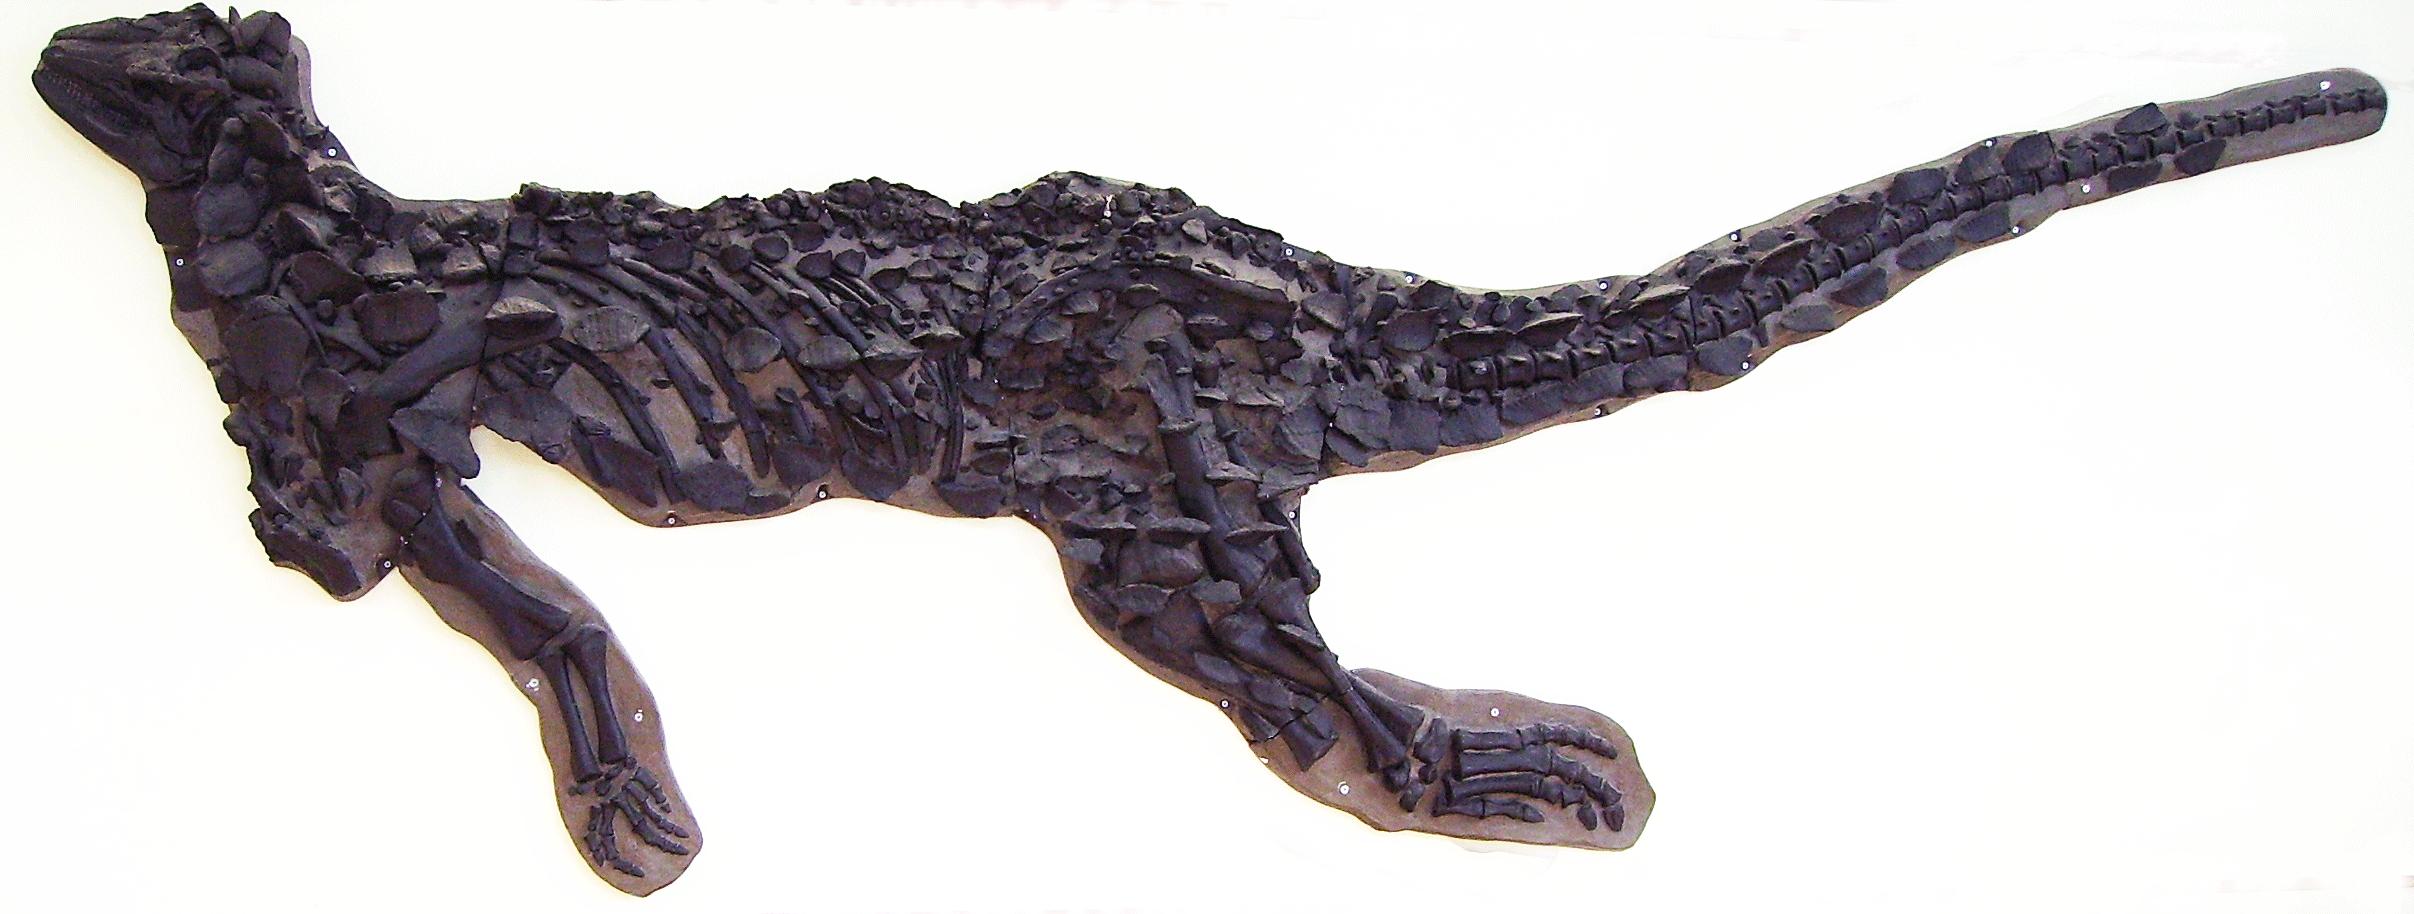 Scelidosaurus_skeleton.png